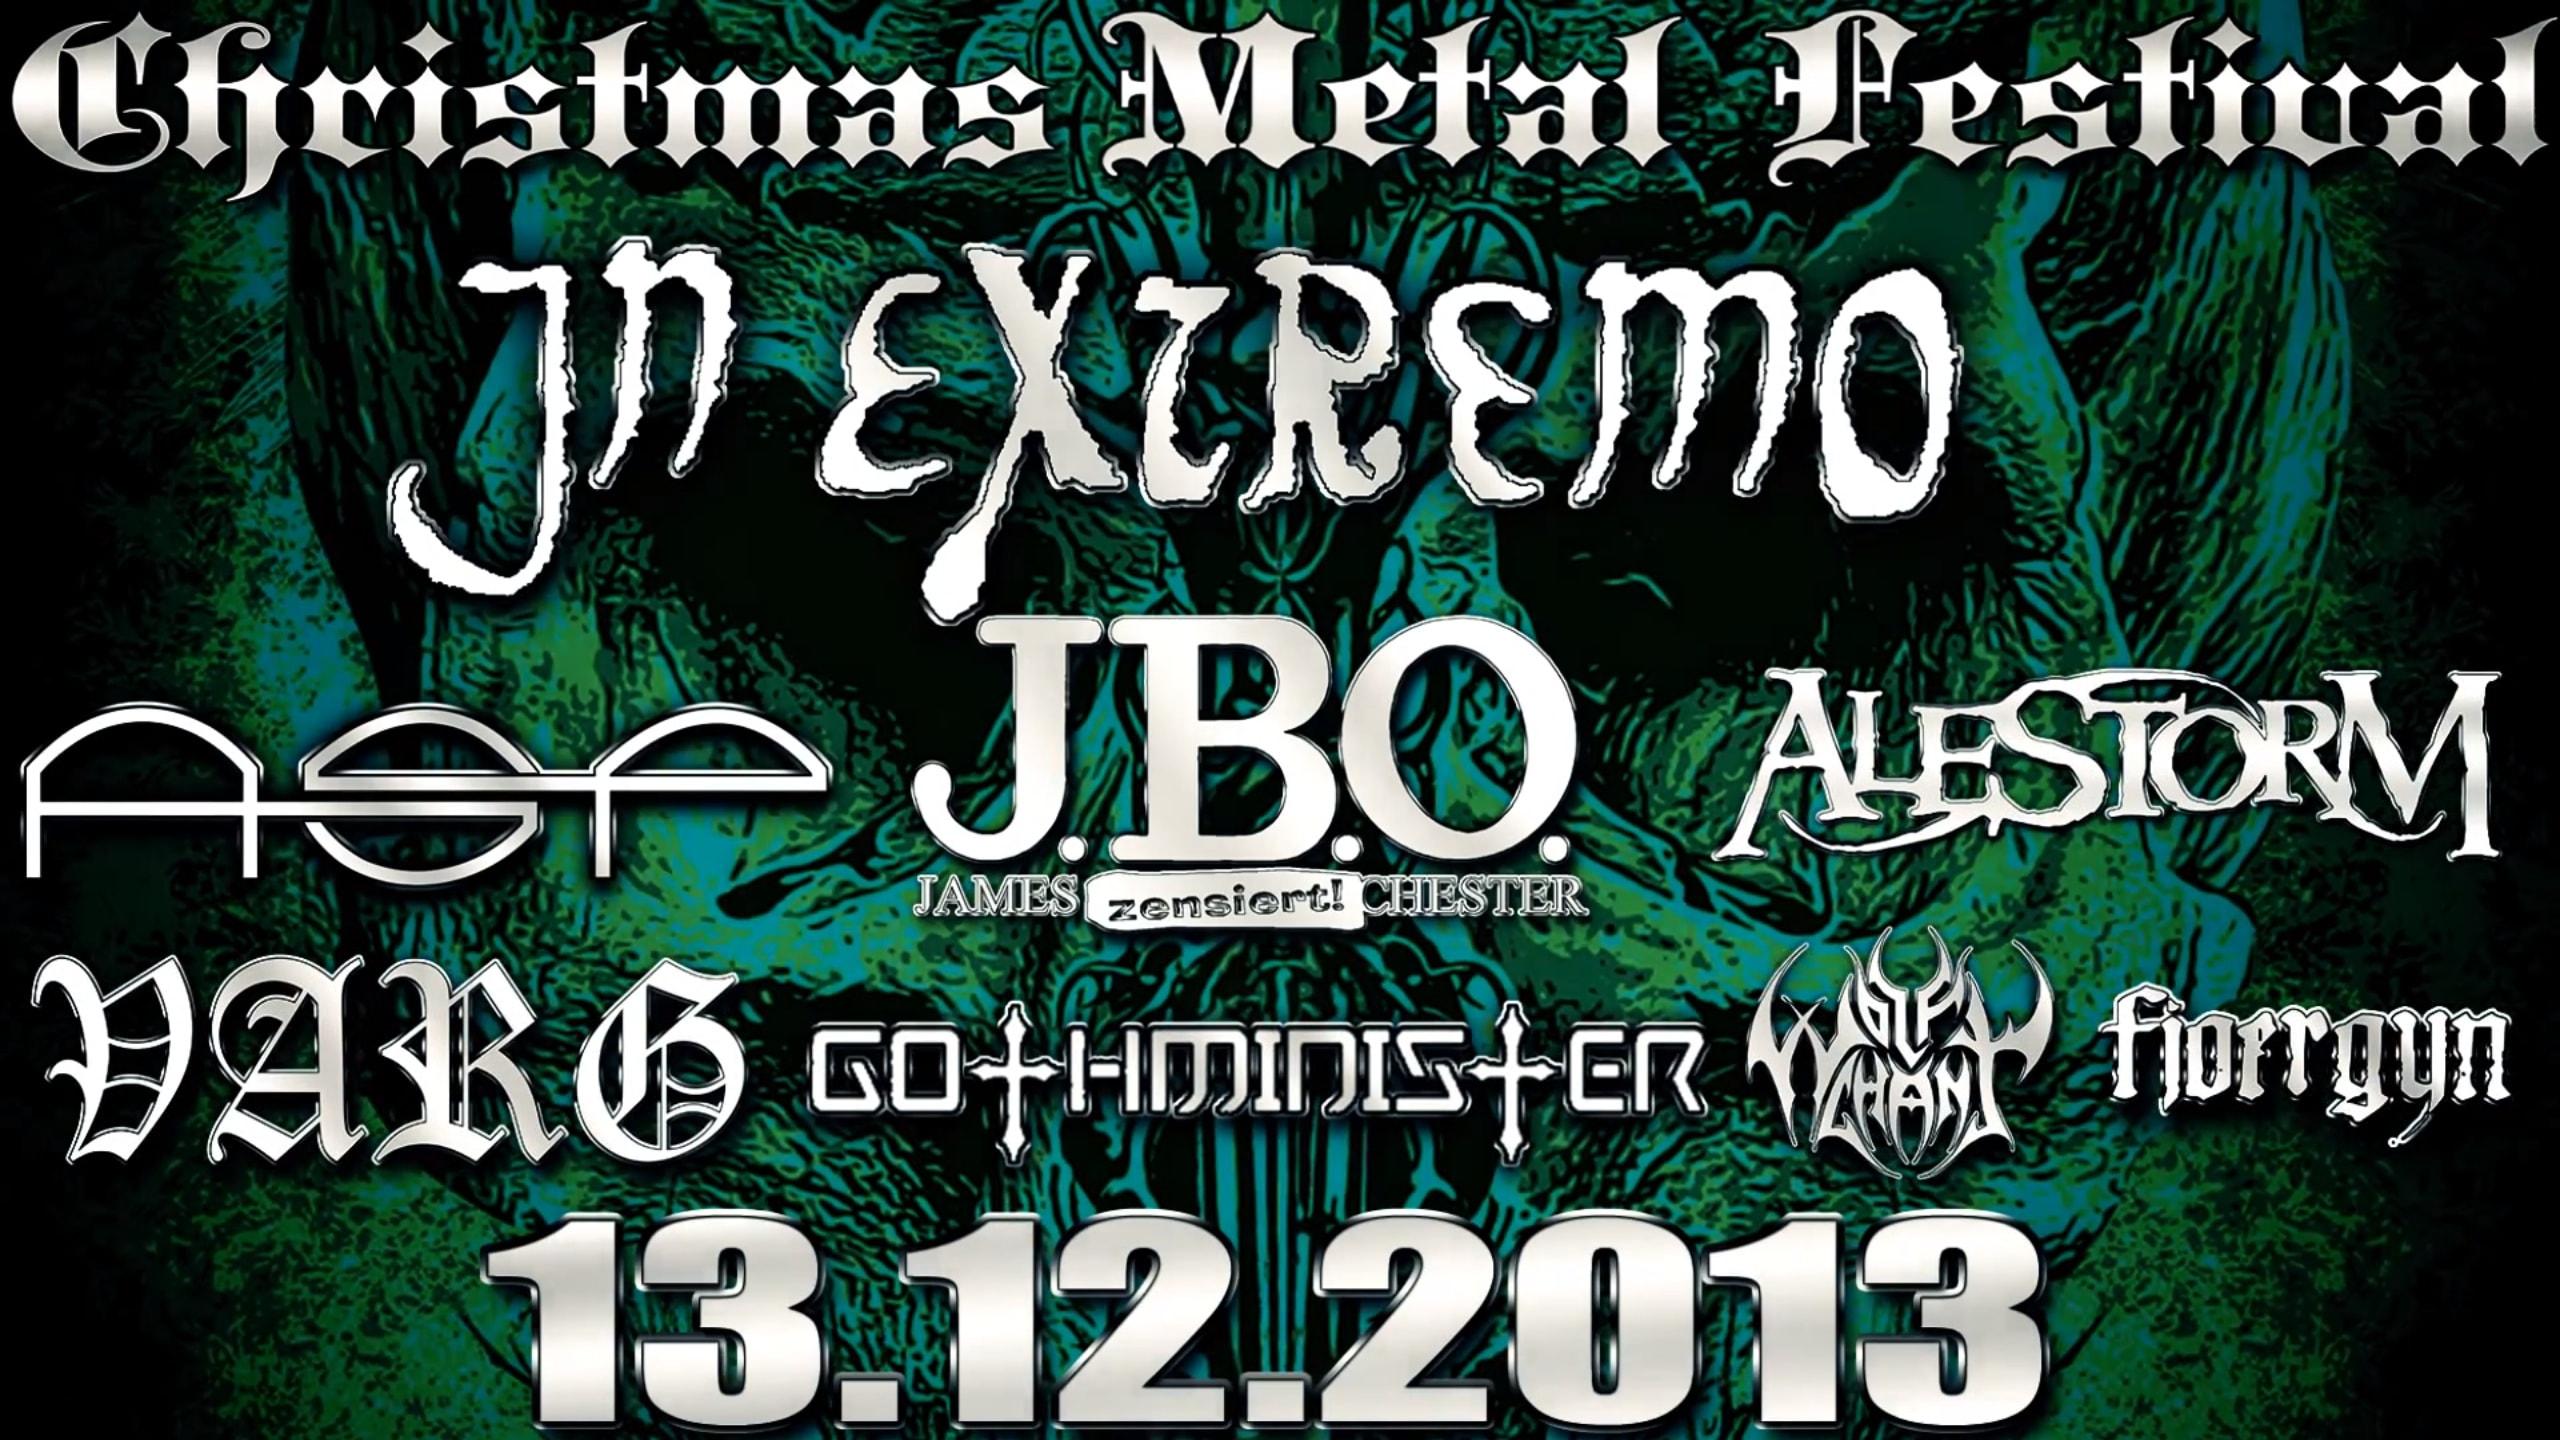 Christmas Metal Festival – besinnlich geht anders!